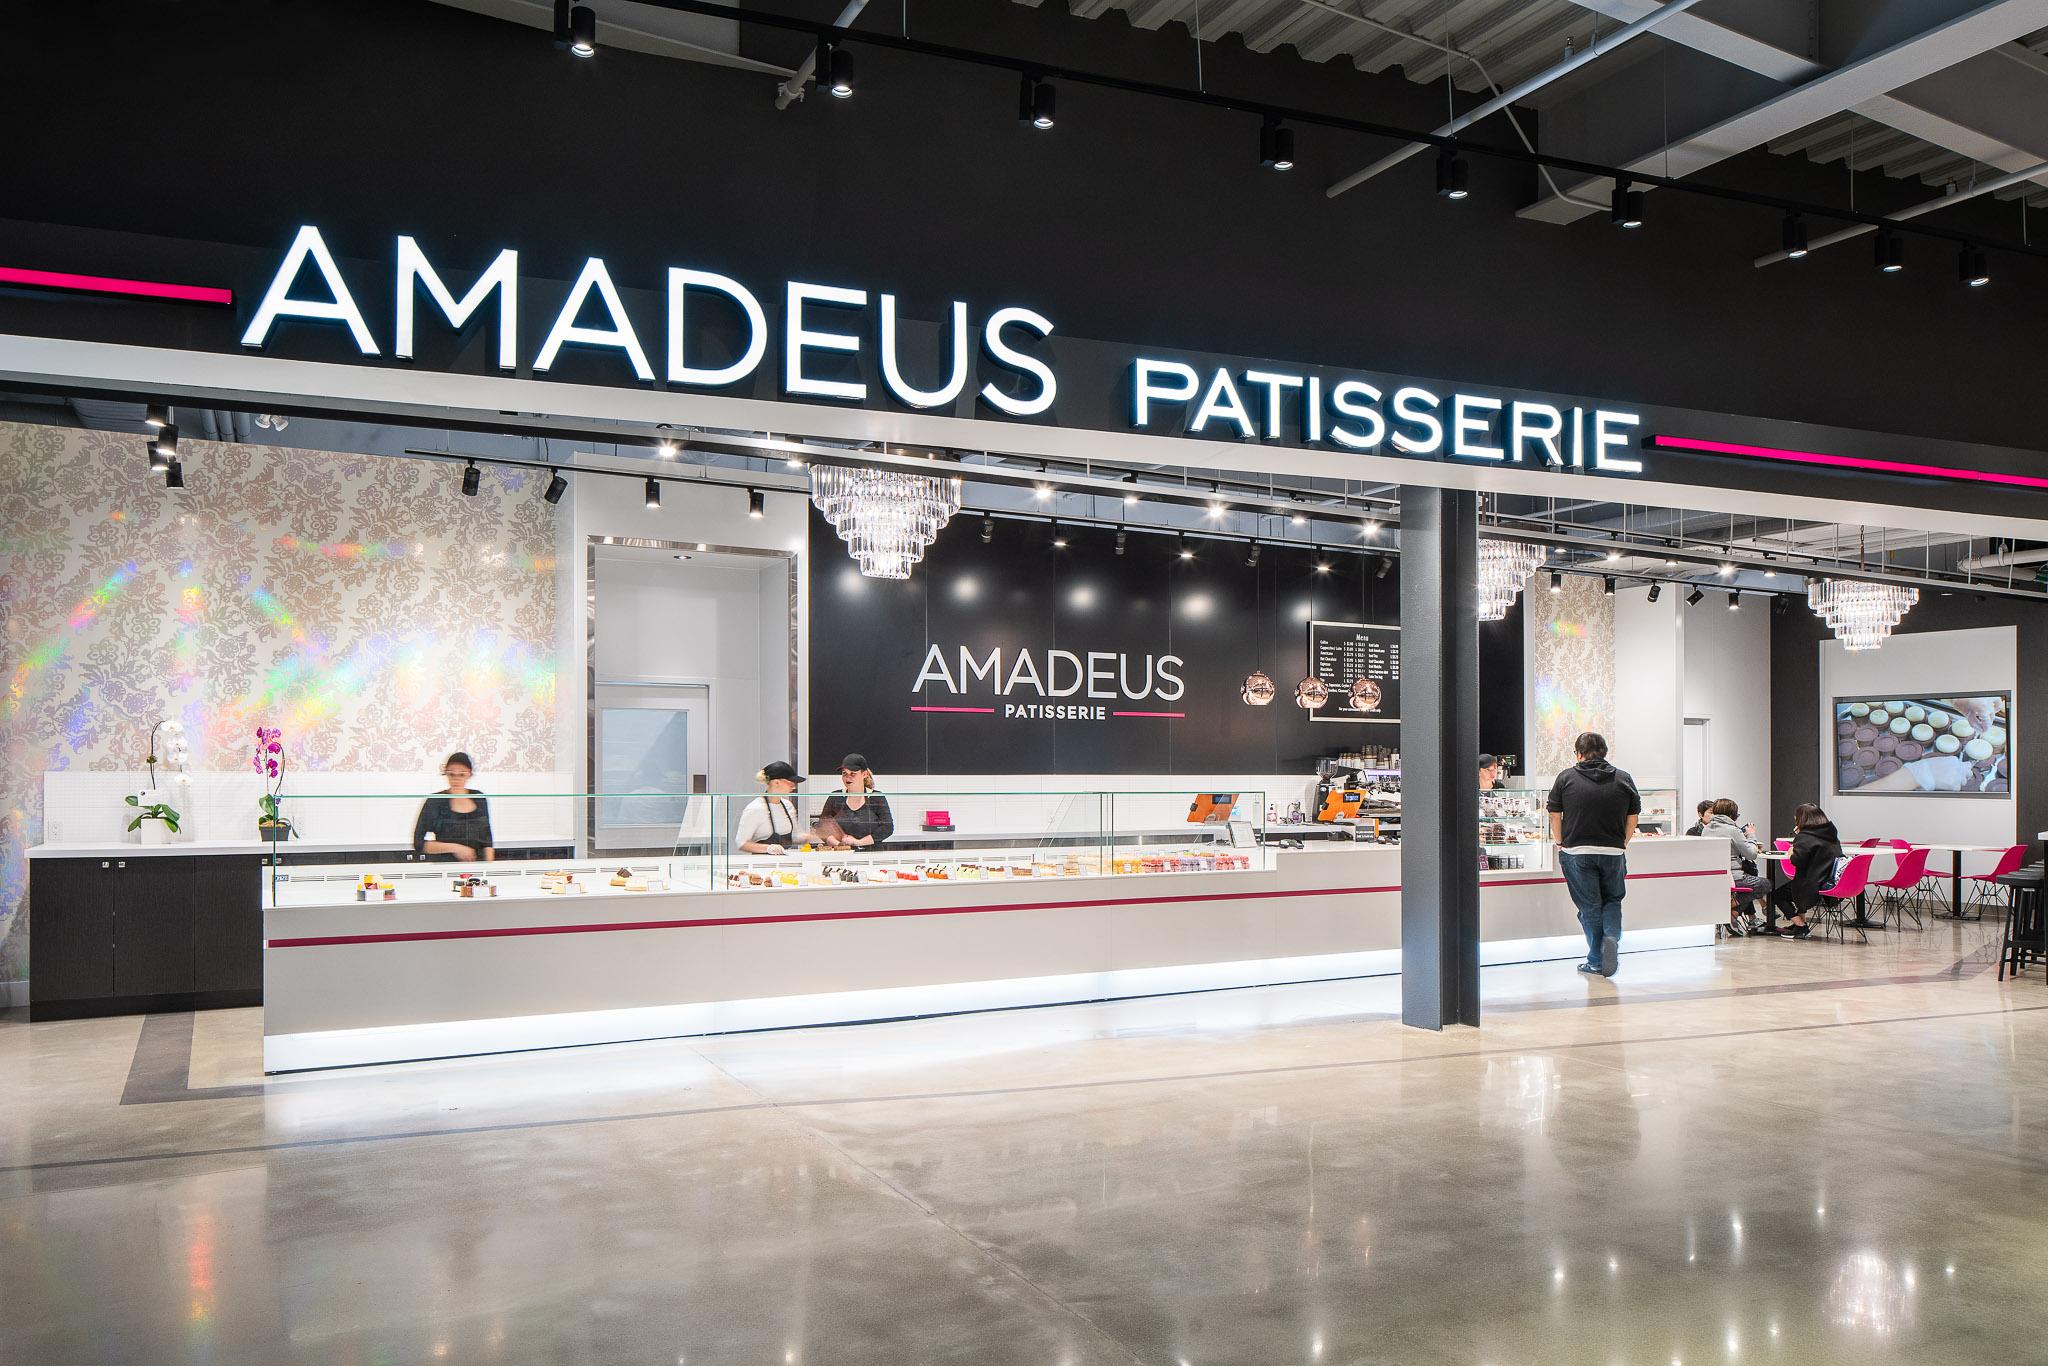 Amadeus 12 2048.jpg